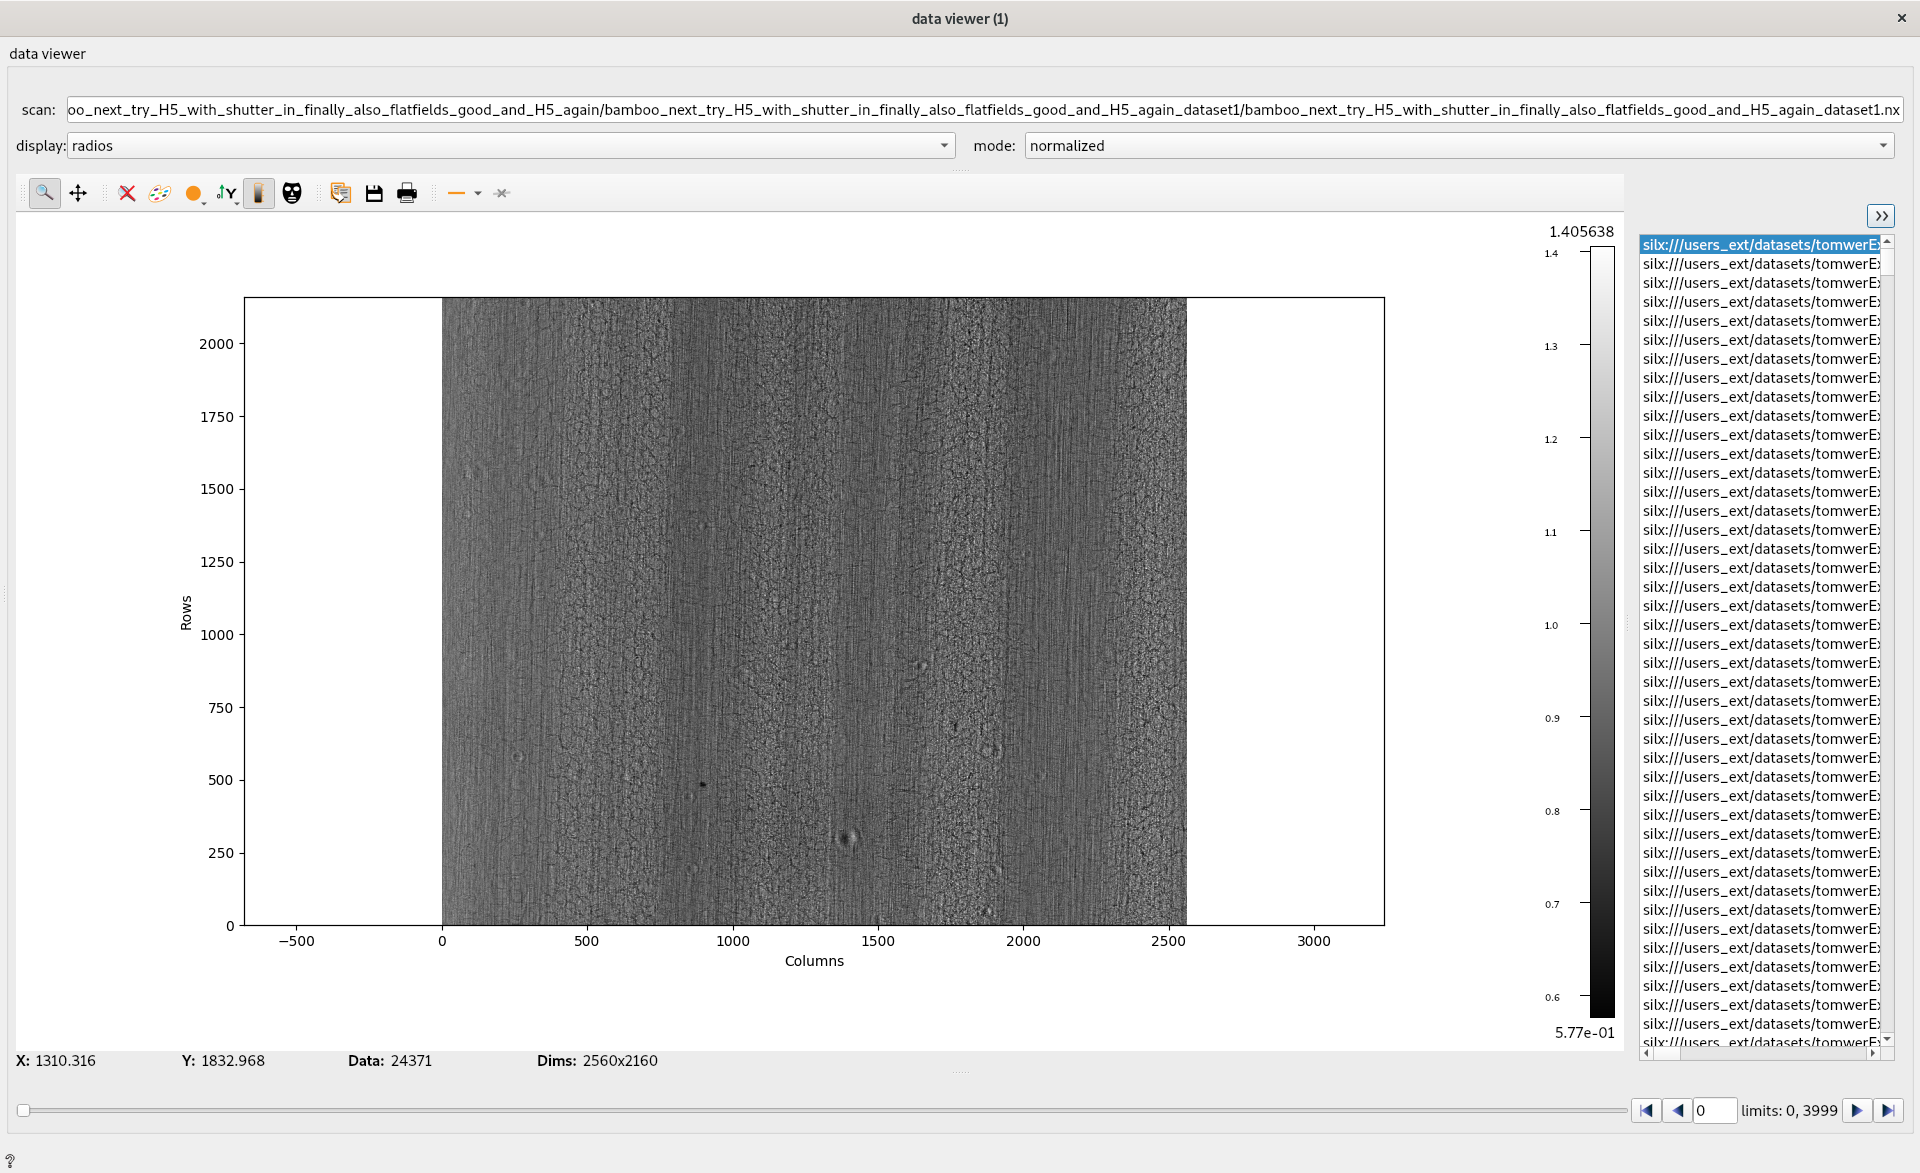 doc/widgets/img/dataviewer.png